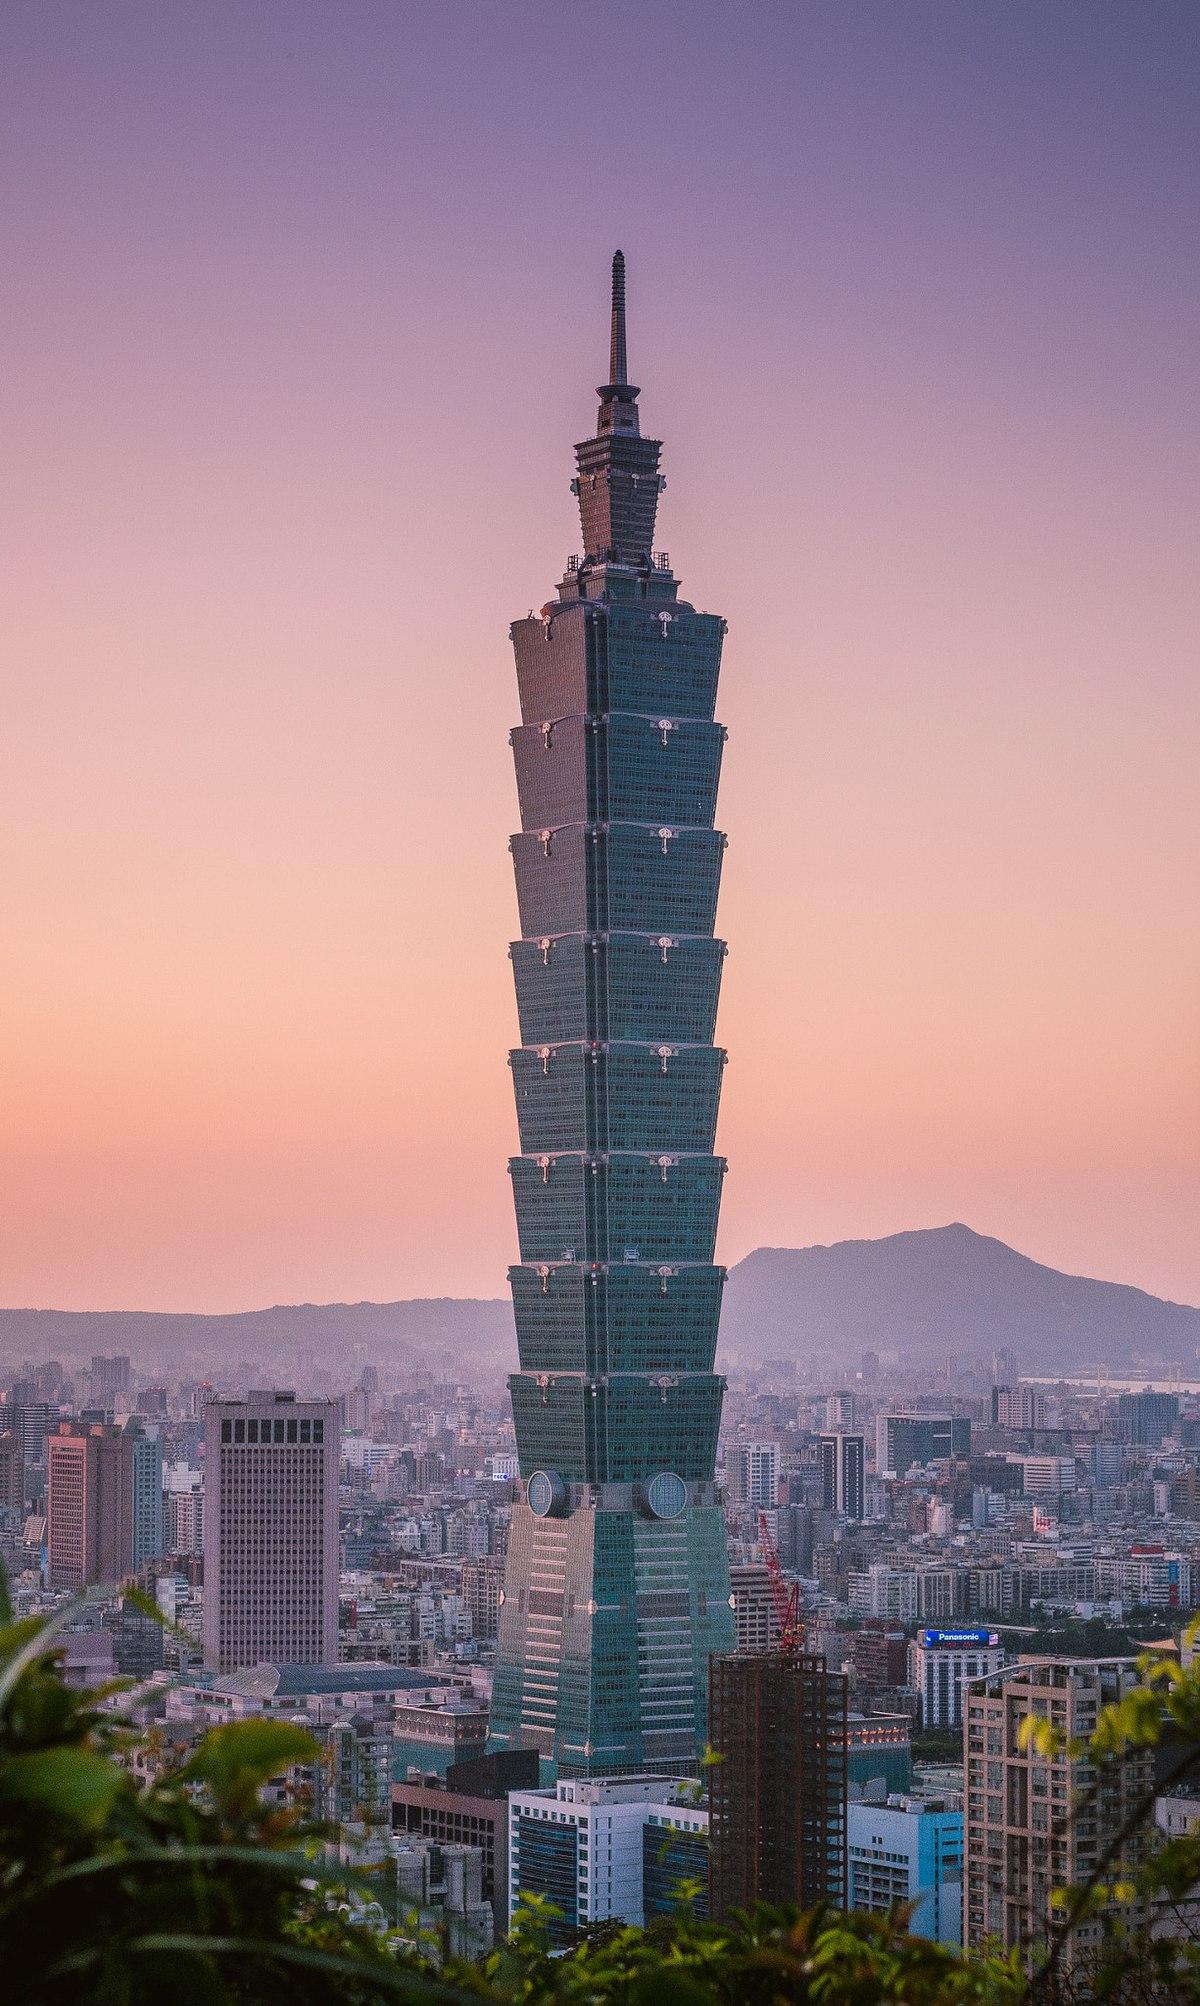 台北101 Wikipedia